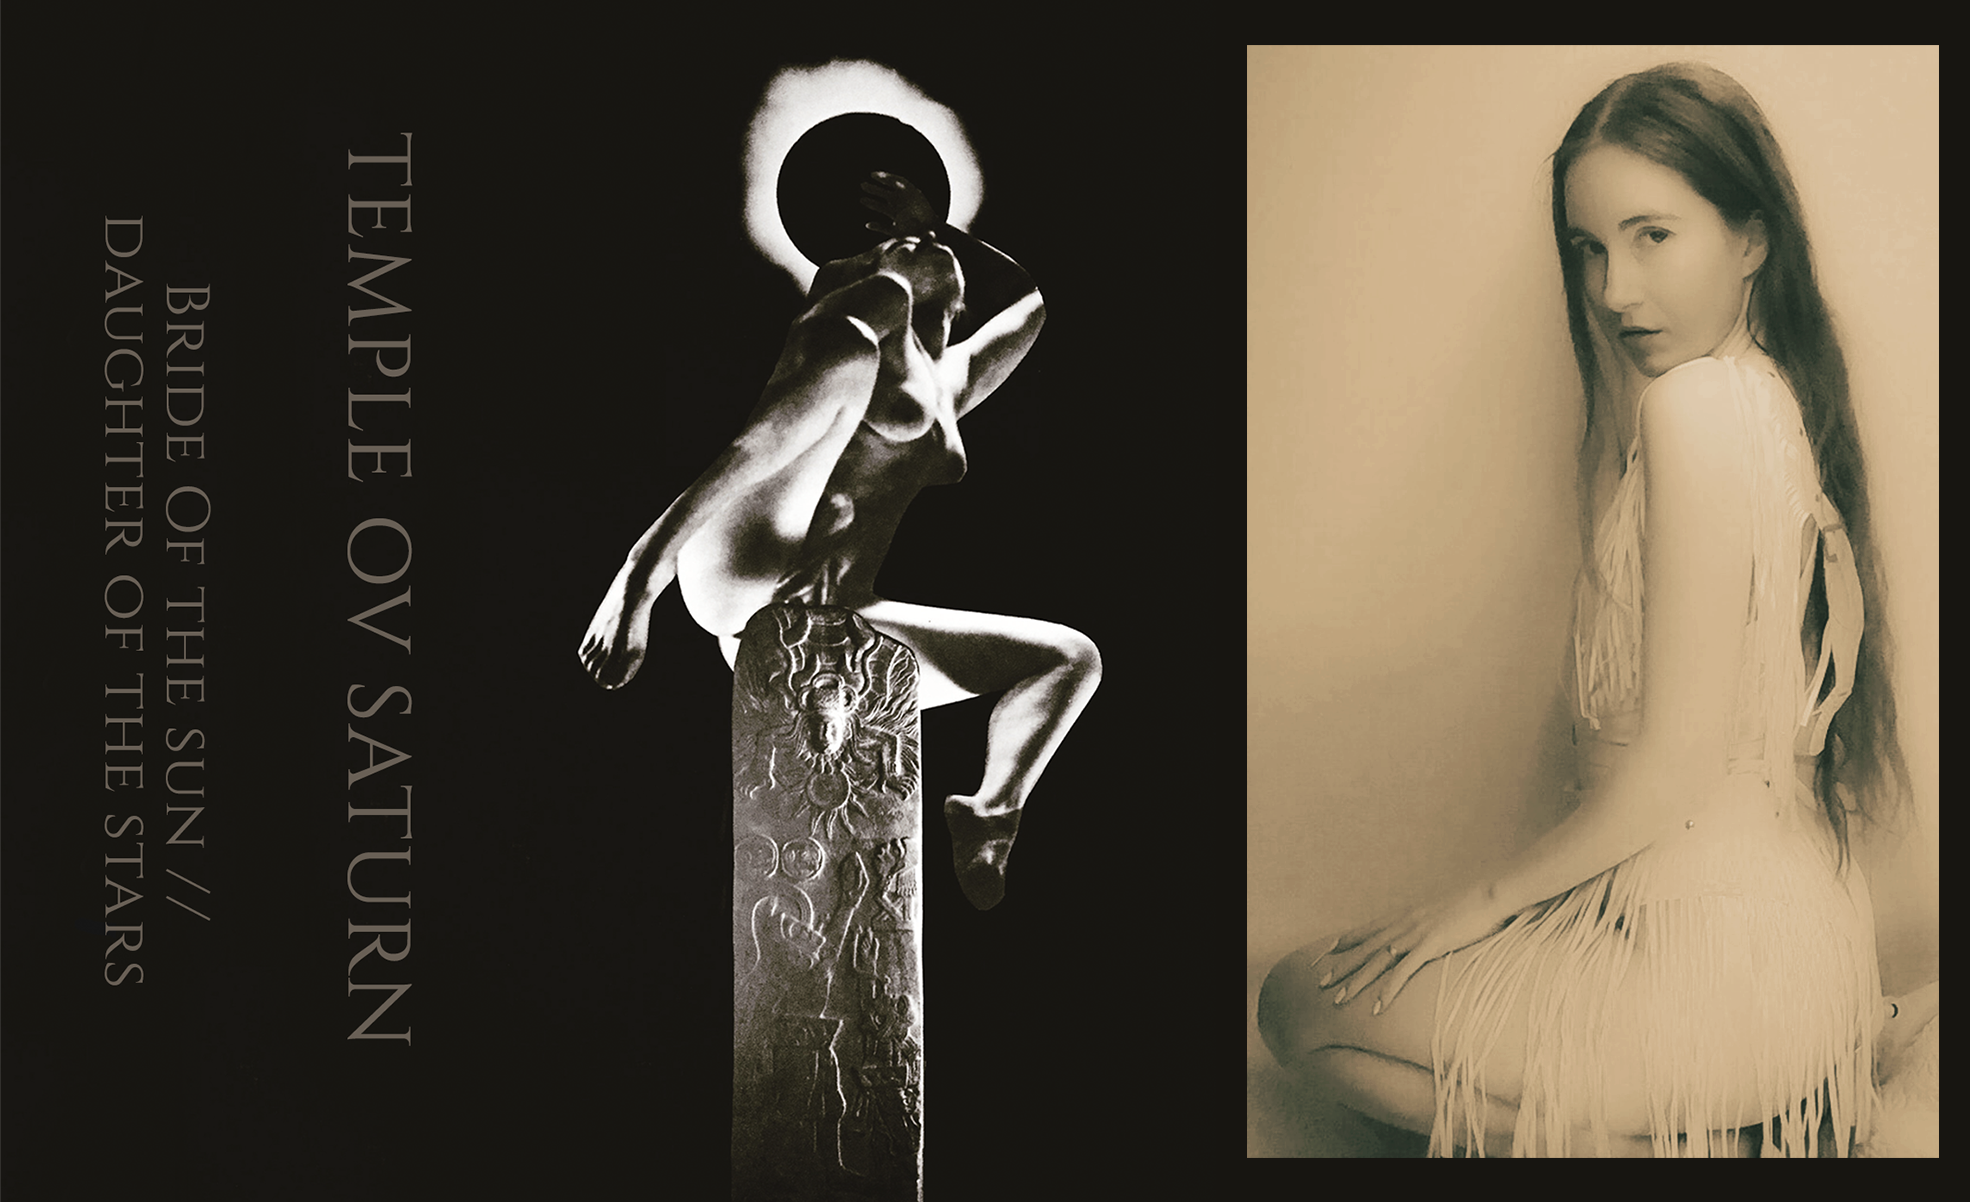 Temple ov Saturn - Bride of the Sun / Daughter of the Stars